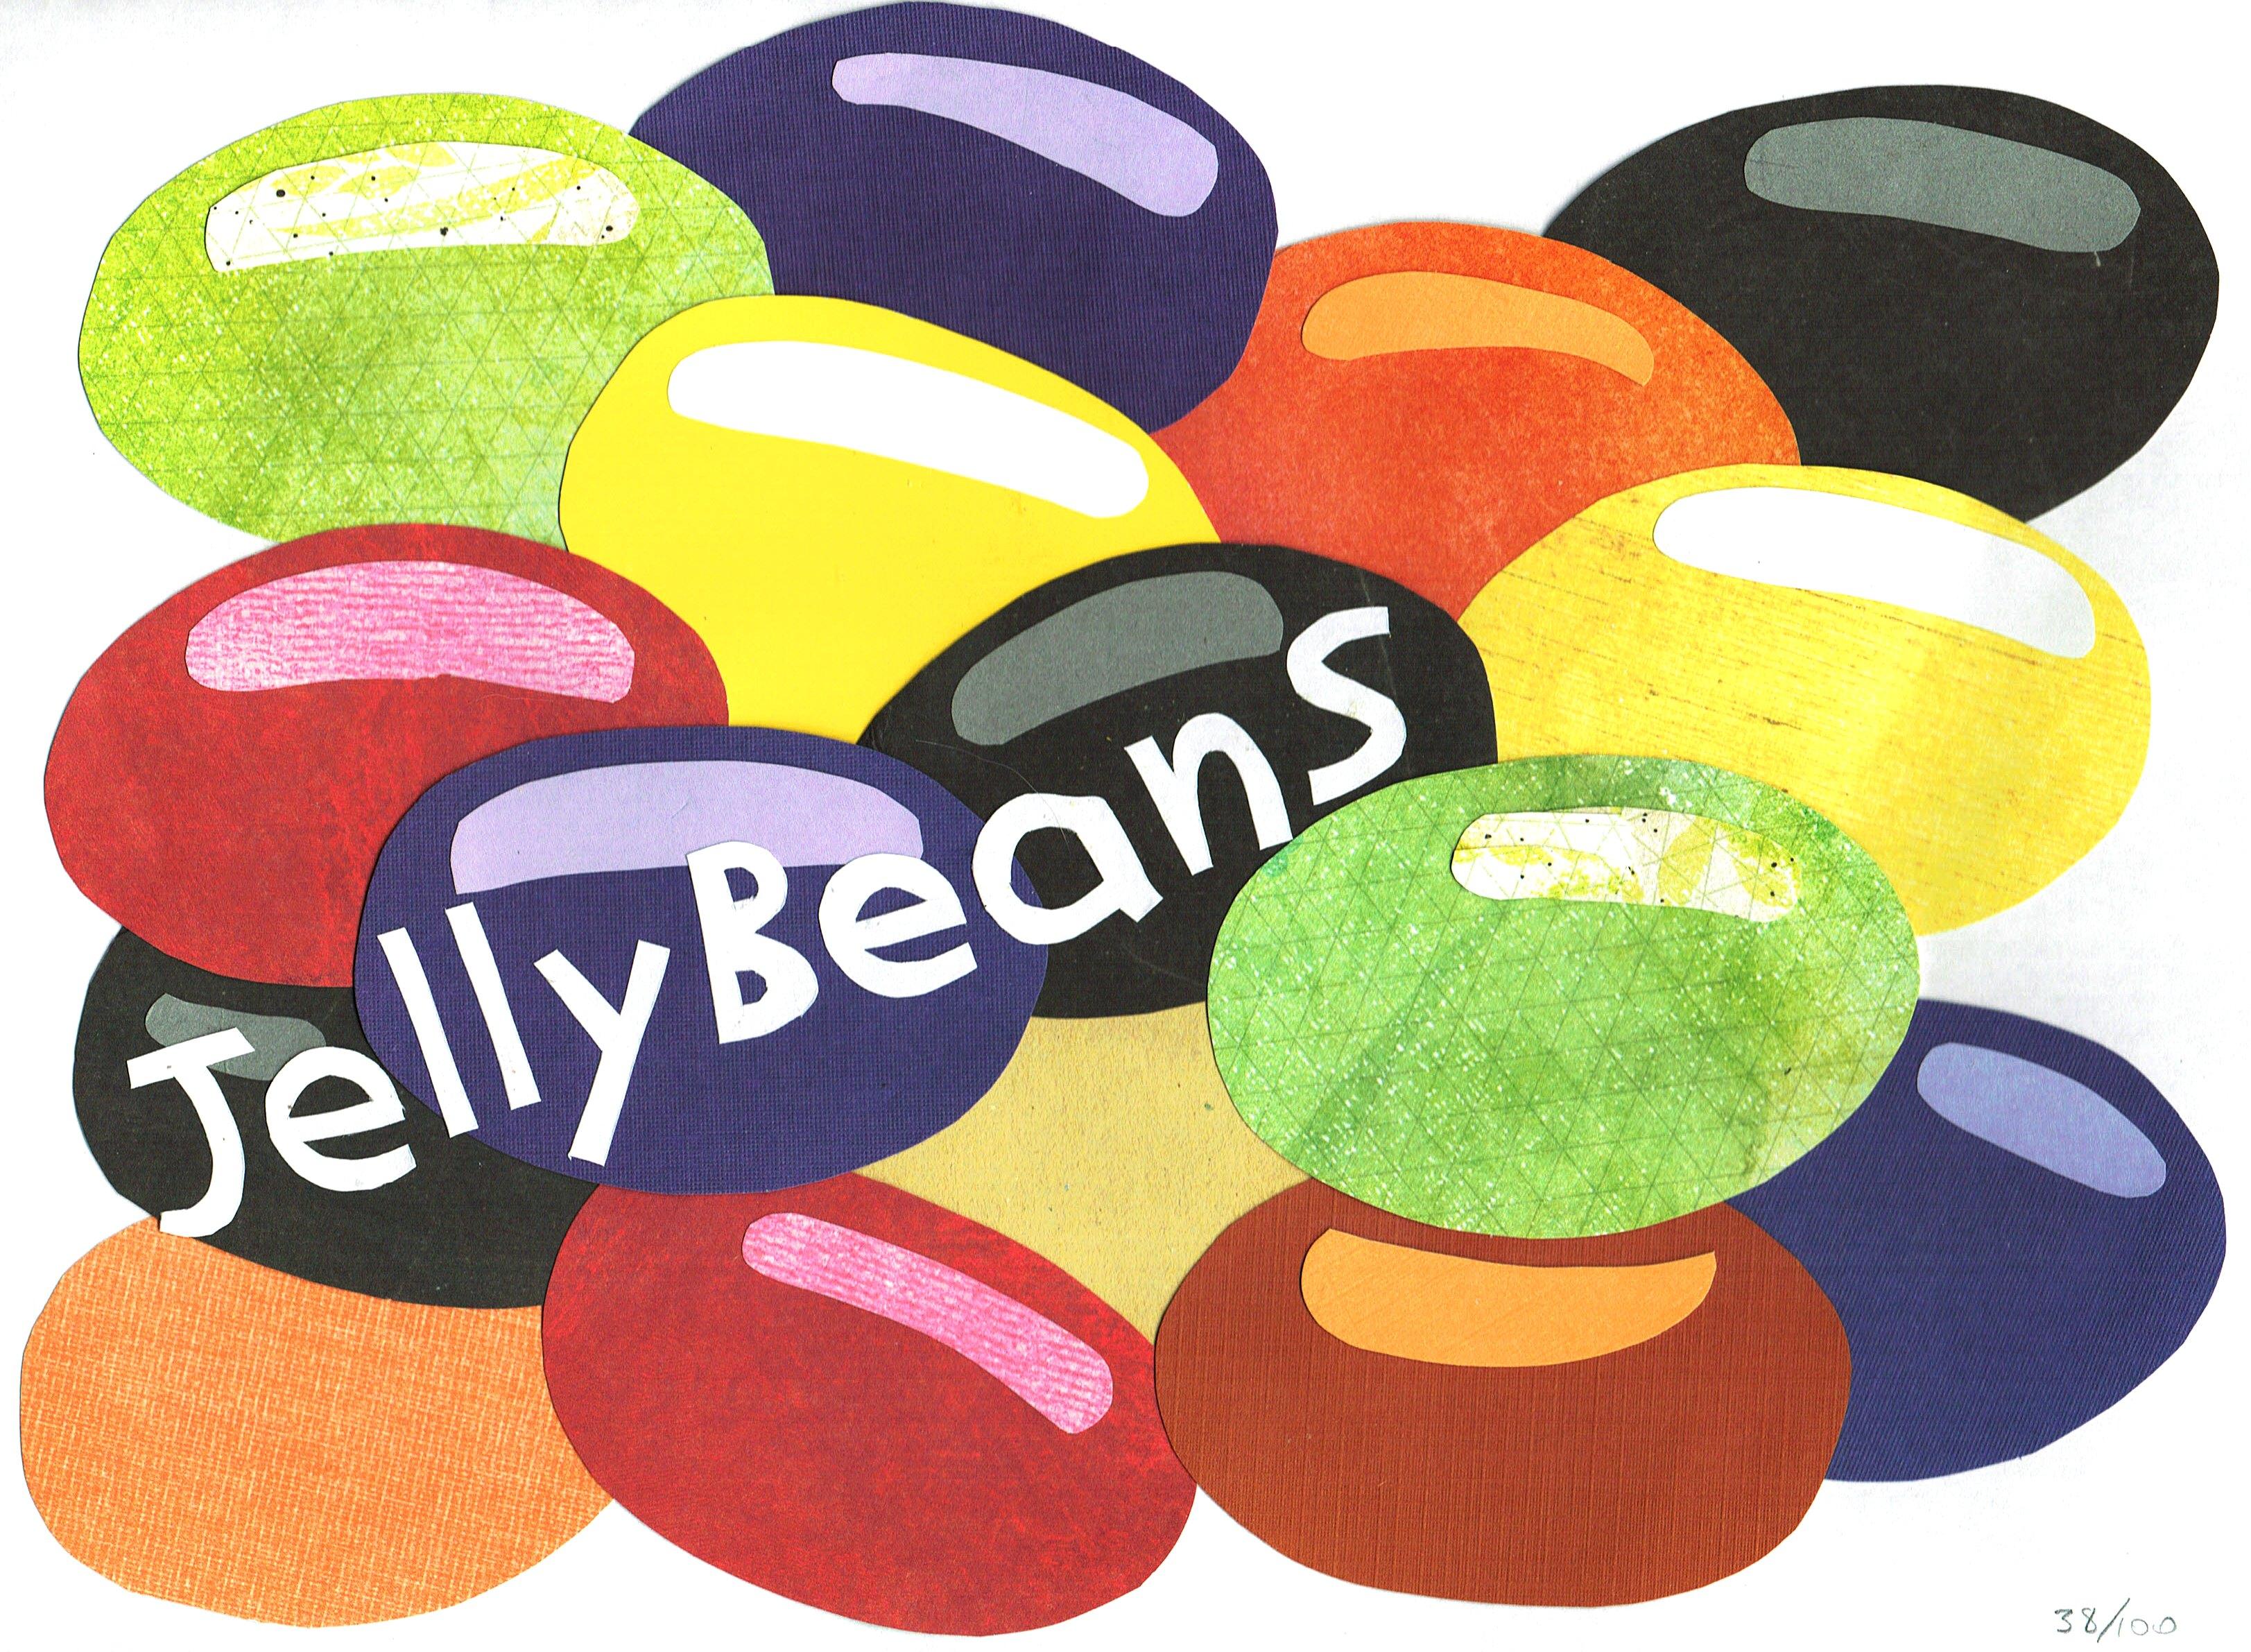 Day 38 - Jellybeans